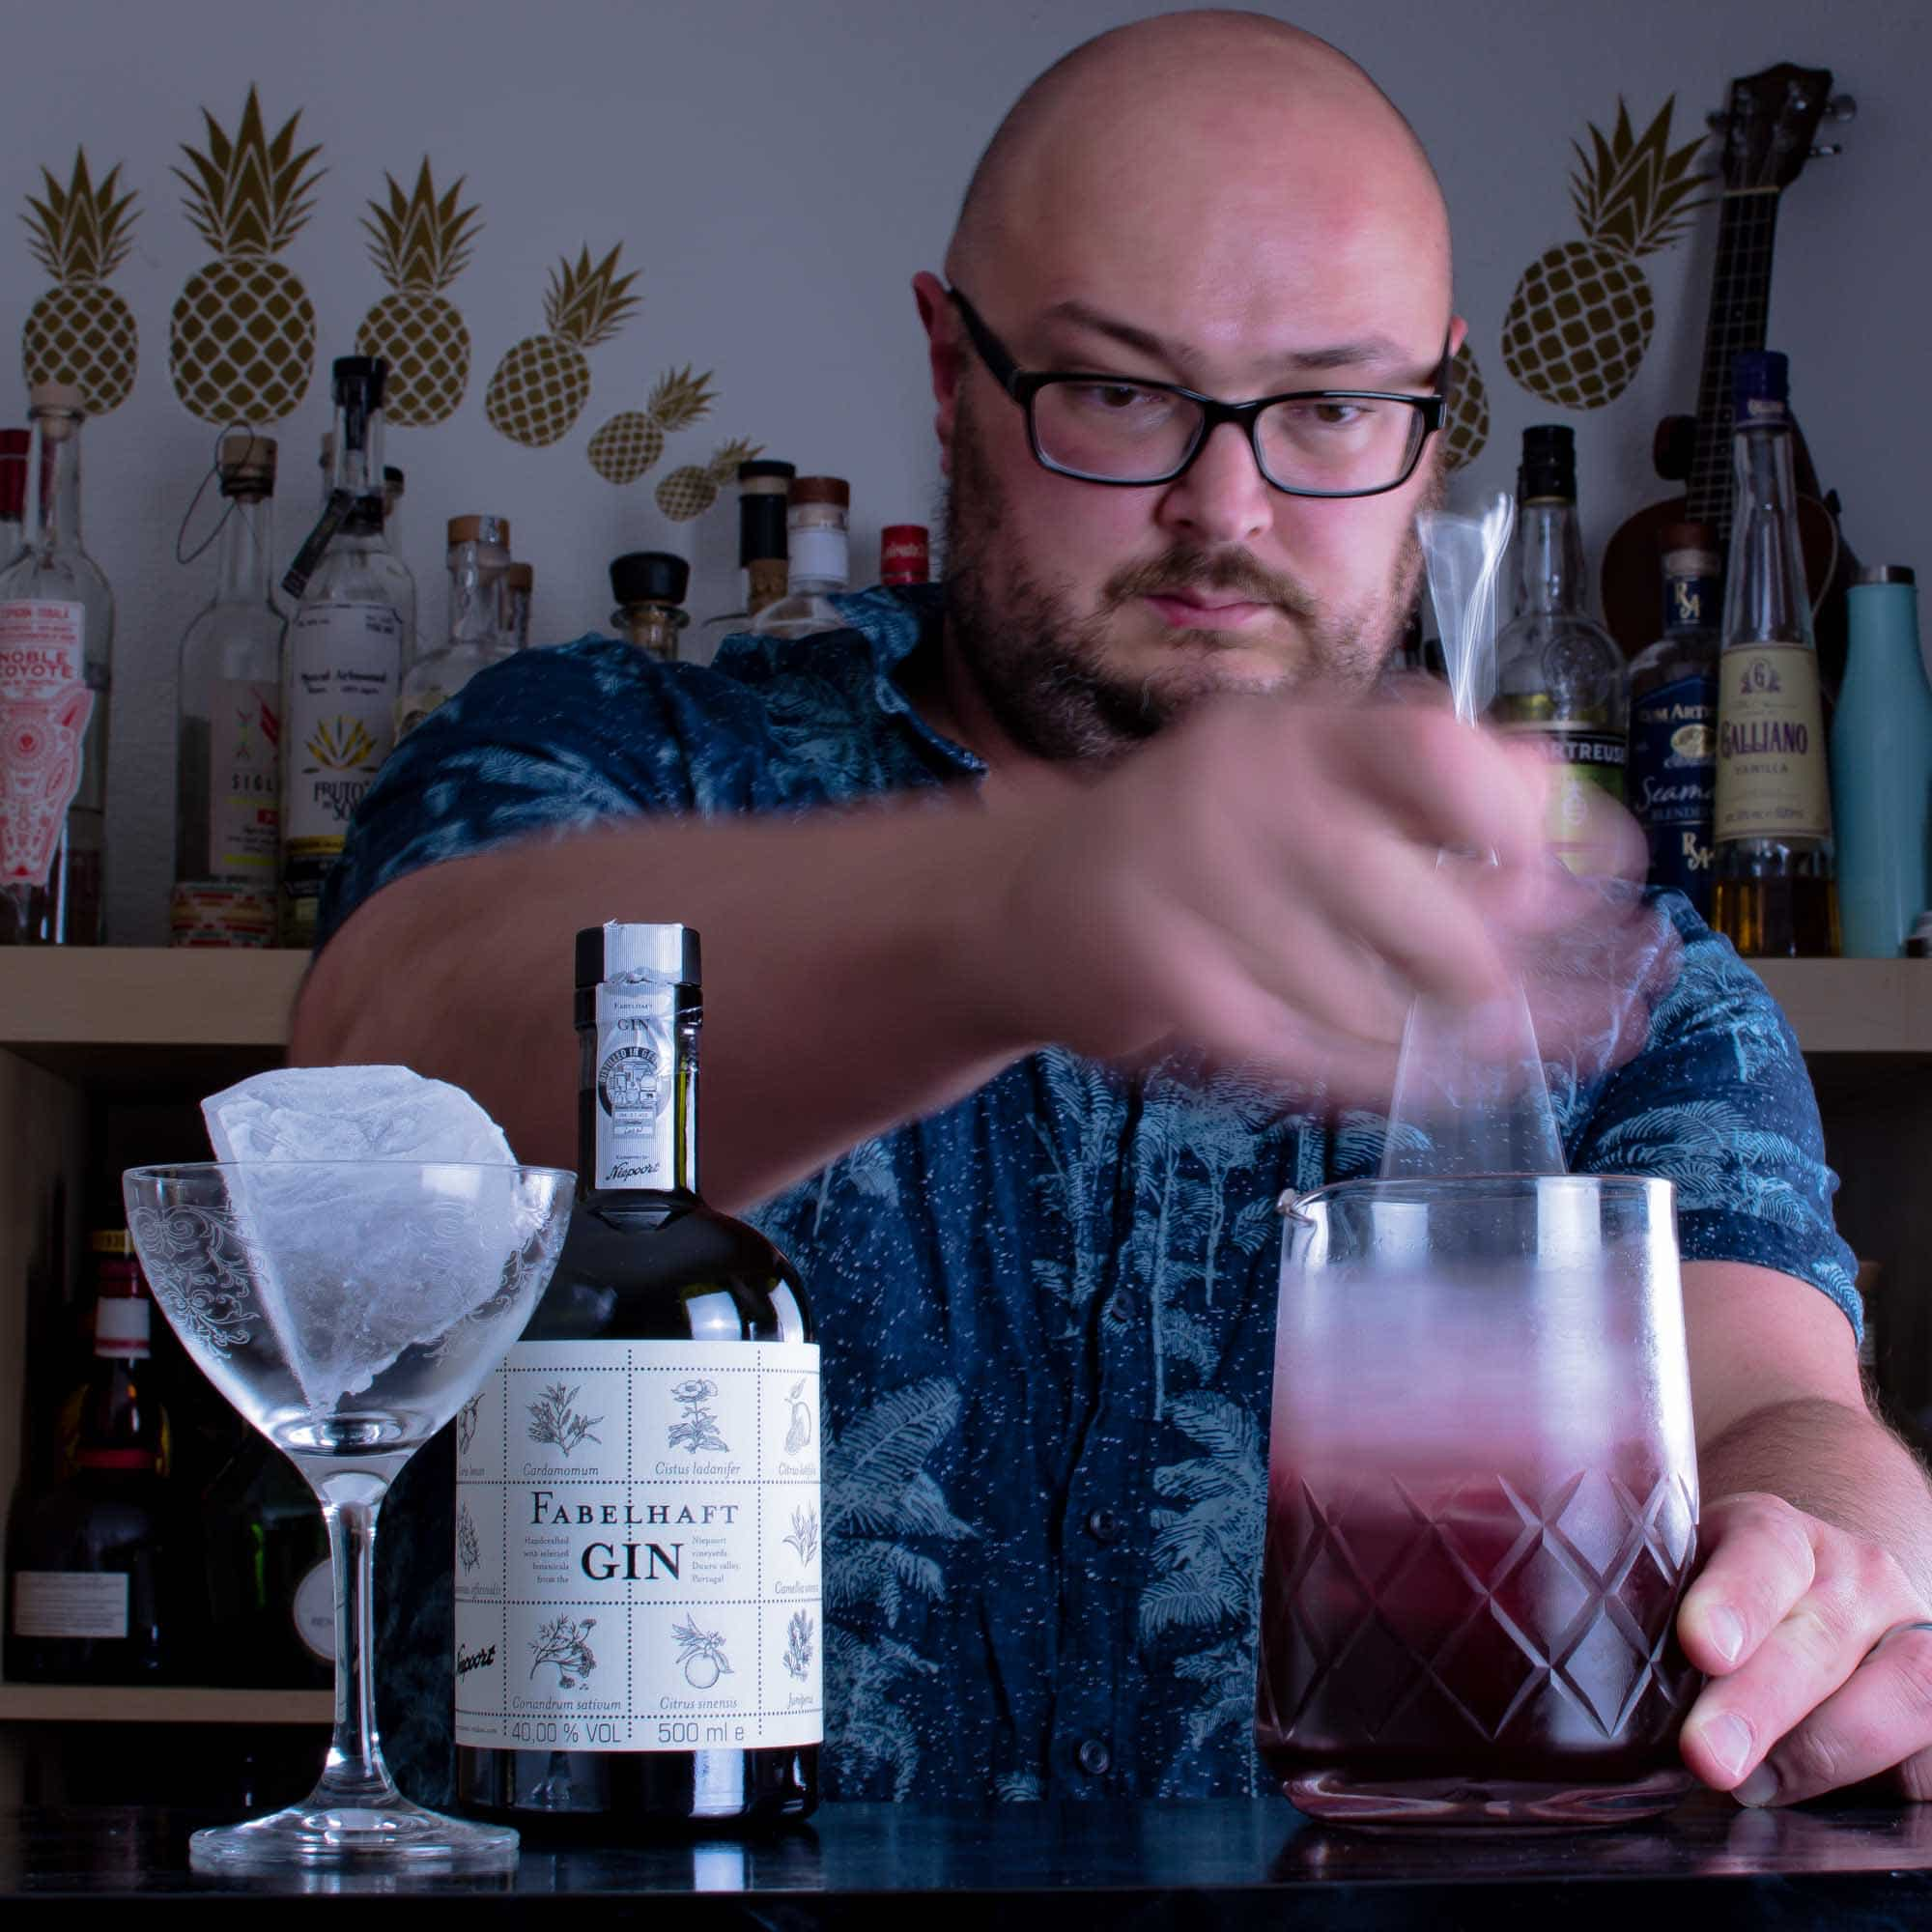 Johann rührt einen Port Martinez mit Fabelhaft Gin.